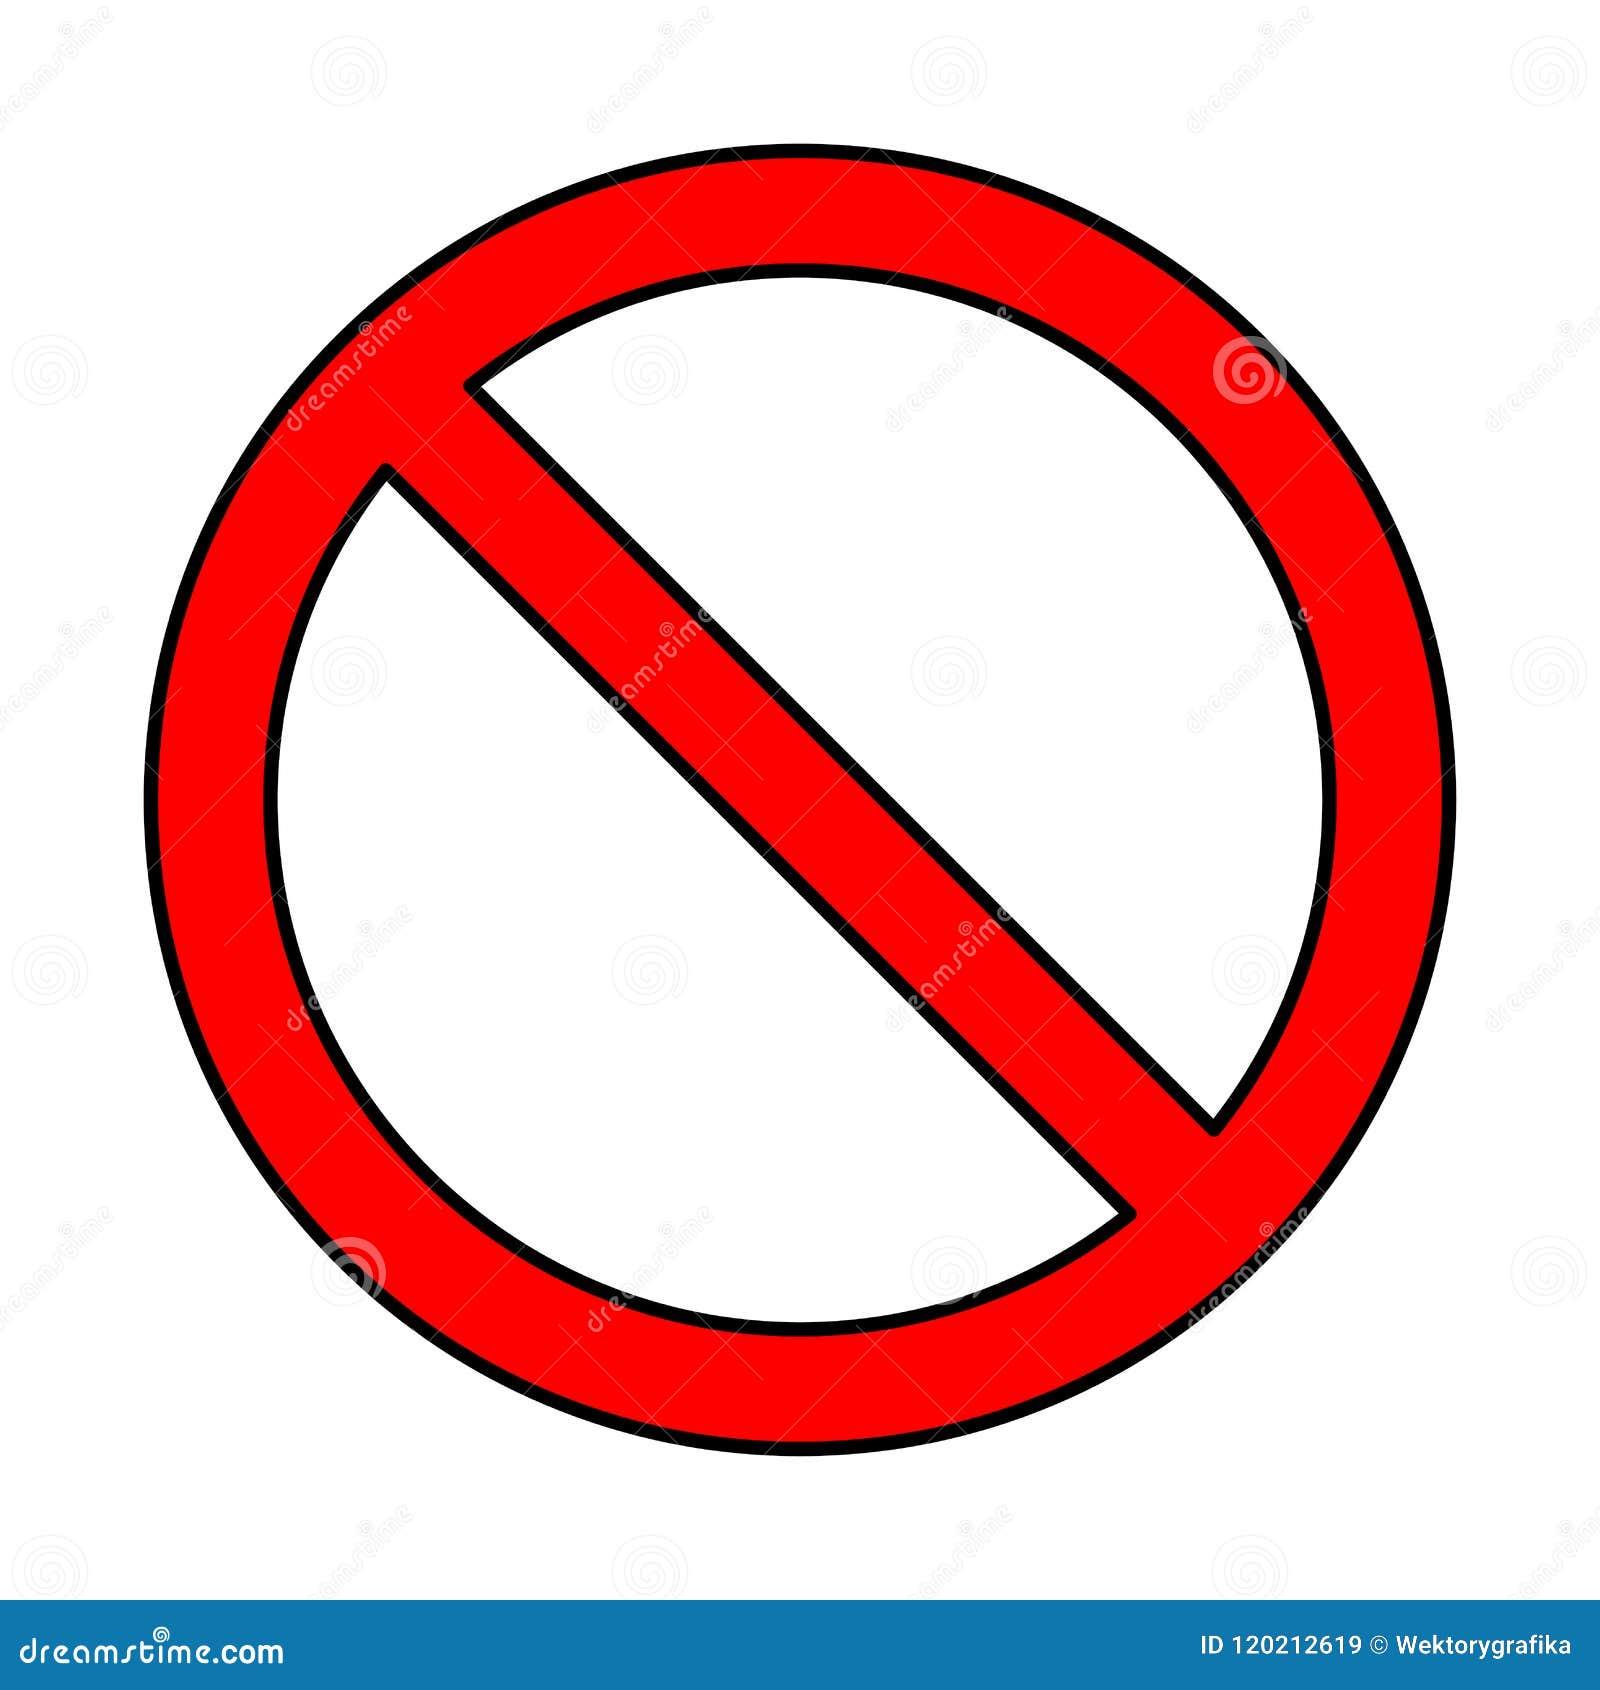 No sign, prohibition symbol design isolated on white background